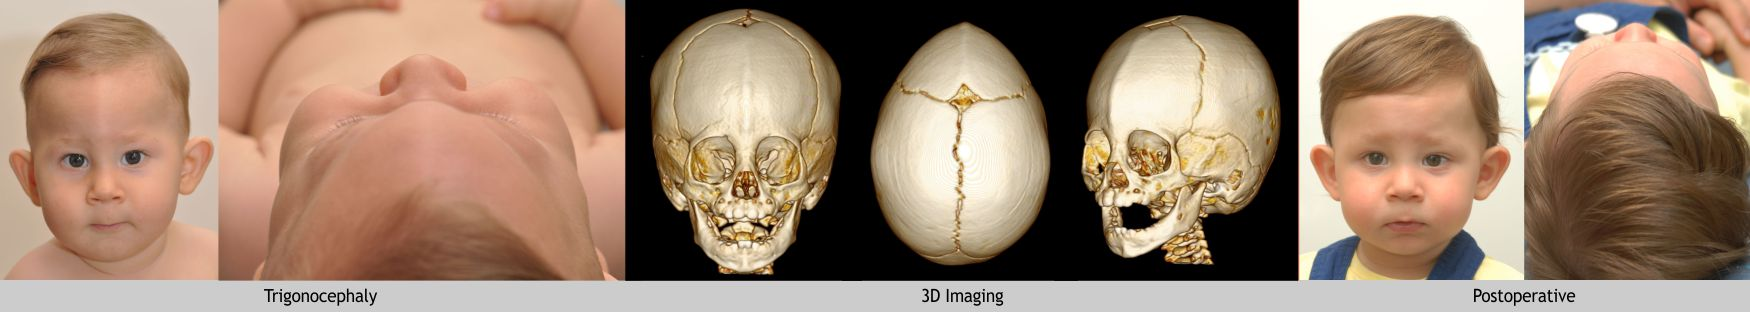 20-trigonocephaly